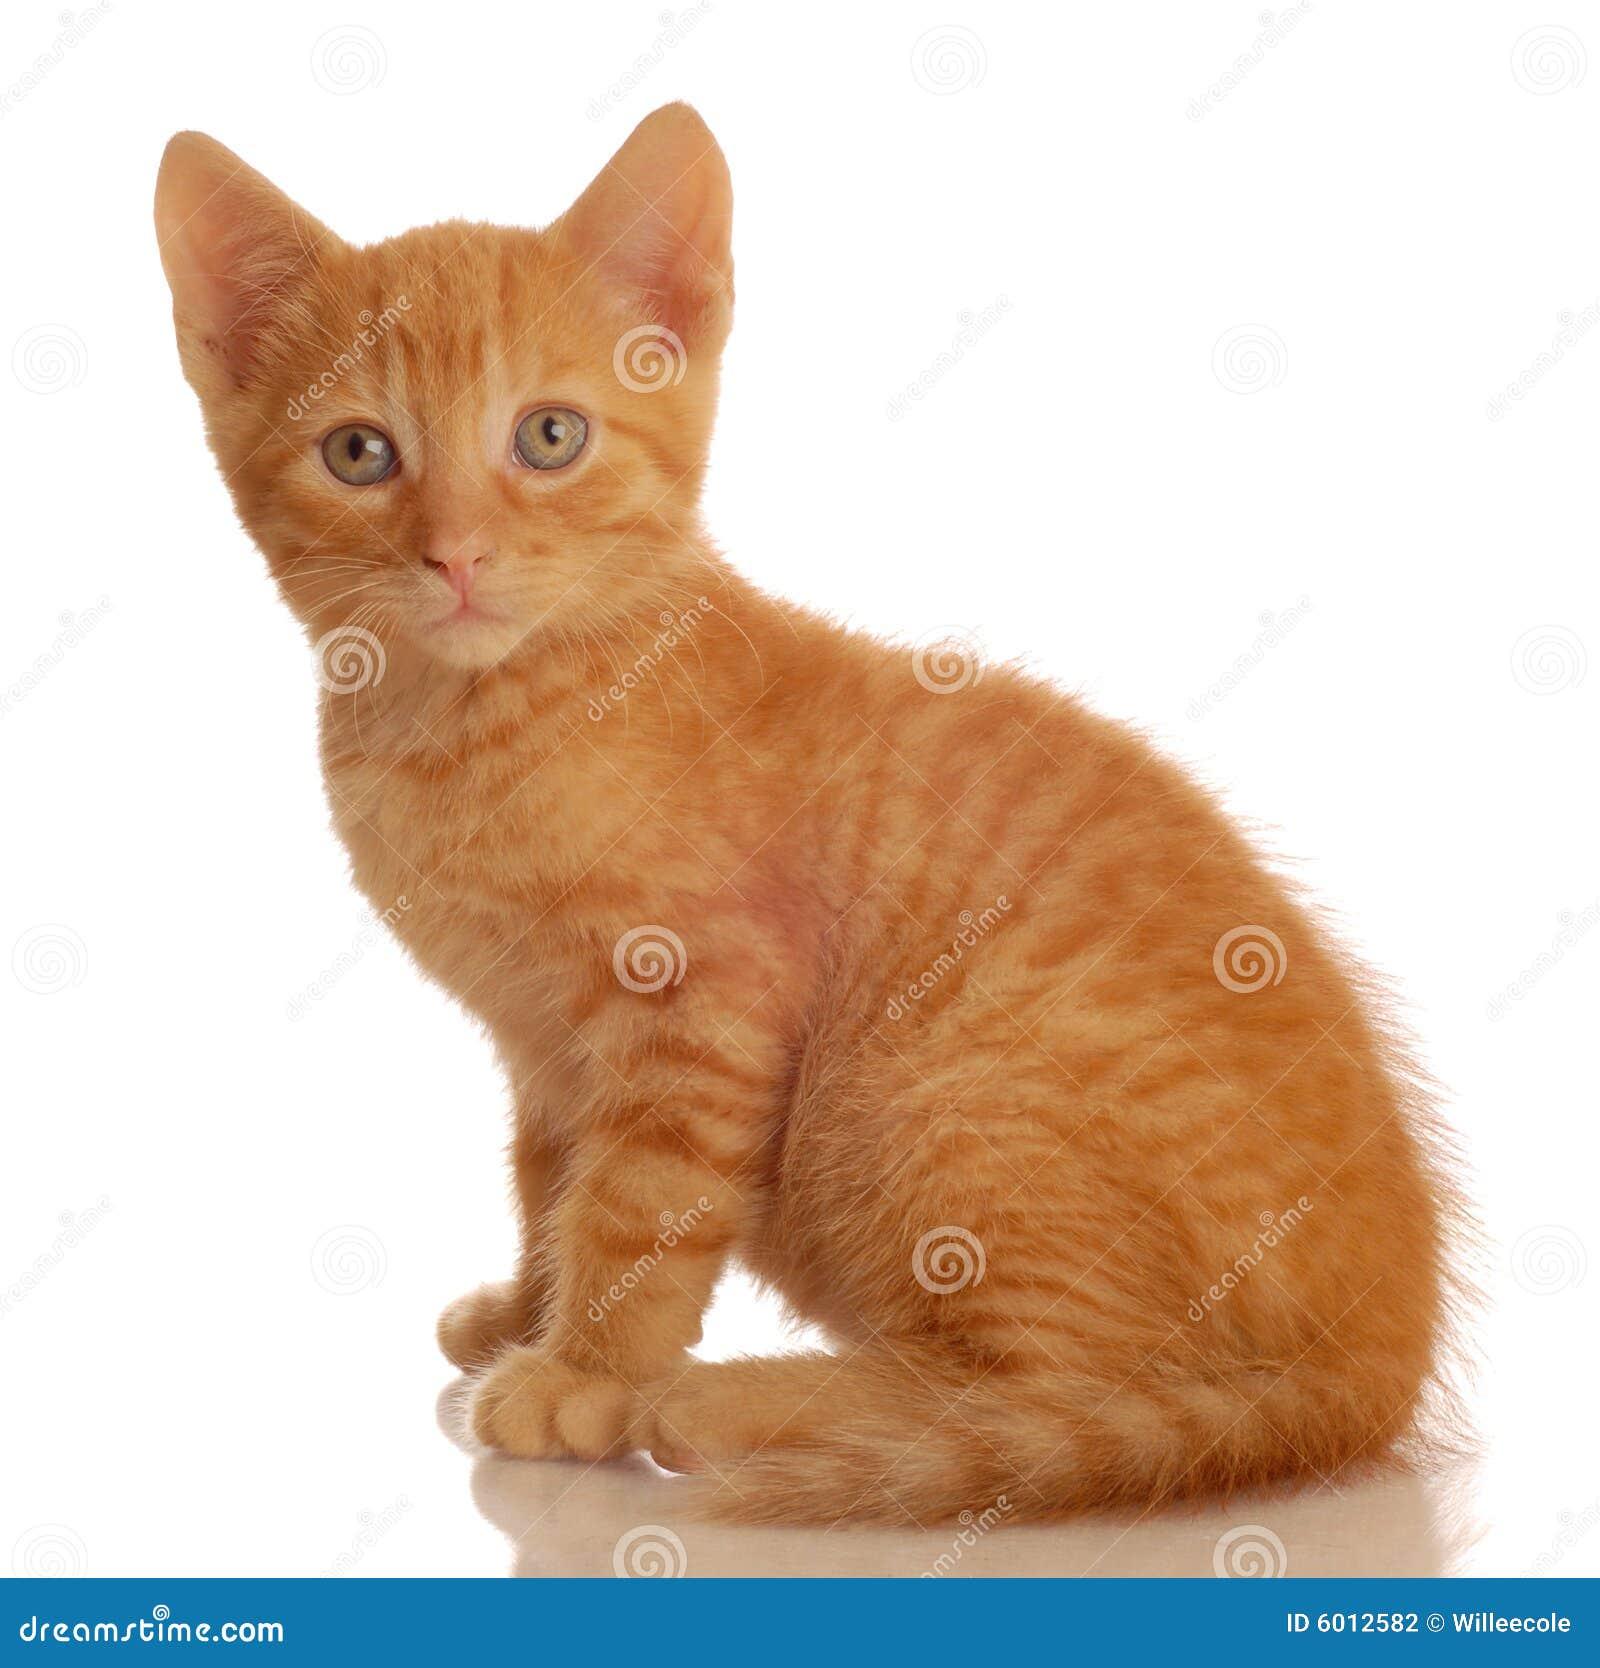 Orange Tabby Kitten Sitting Stock graphy Image